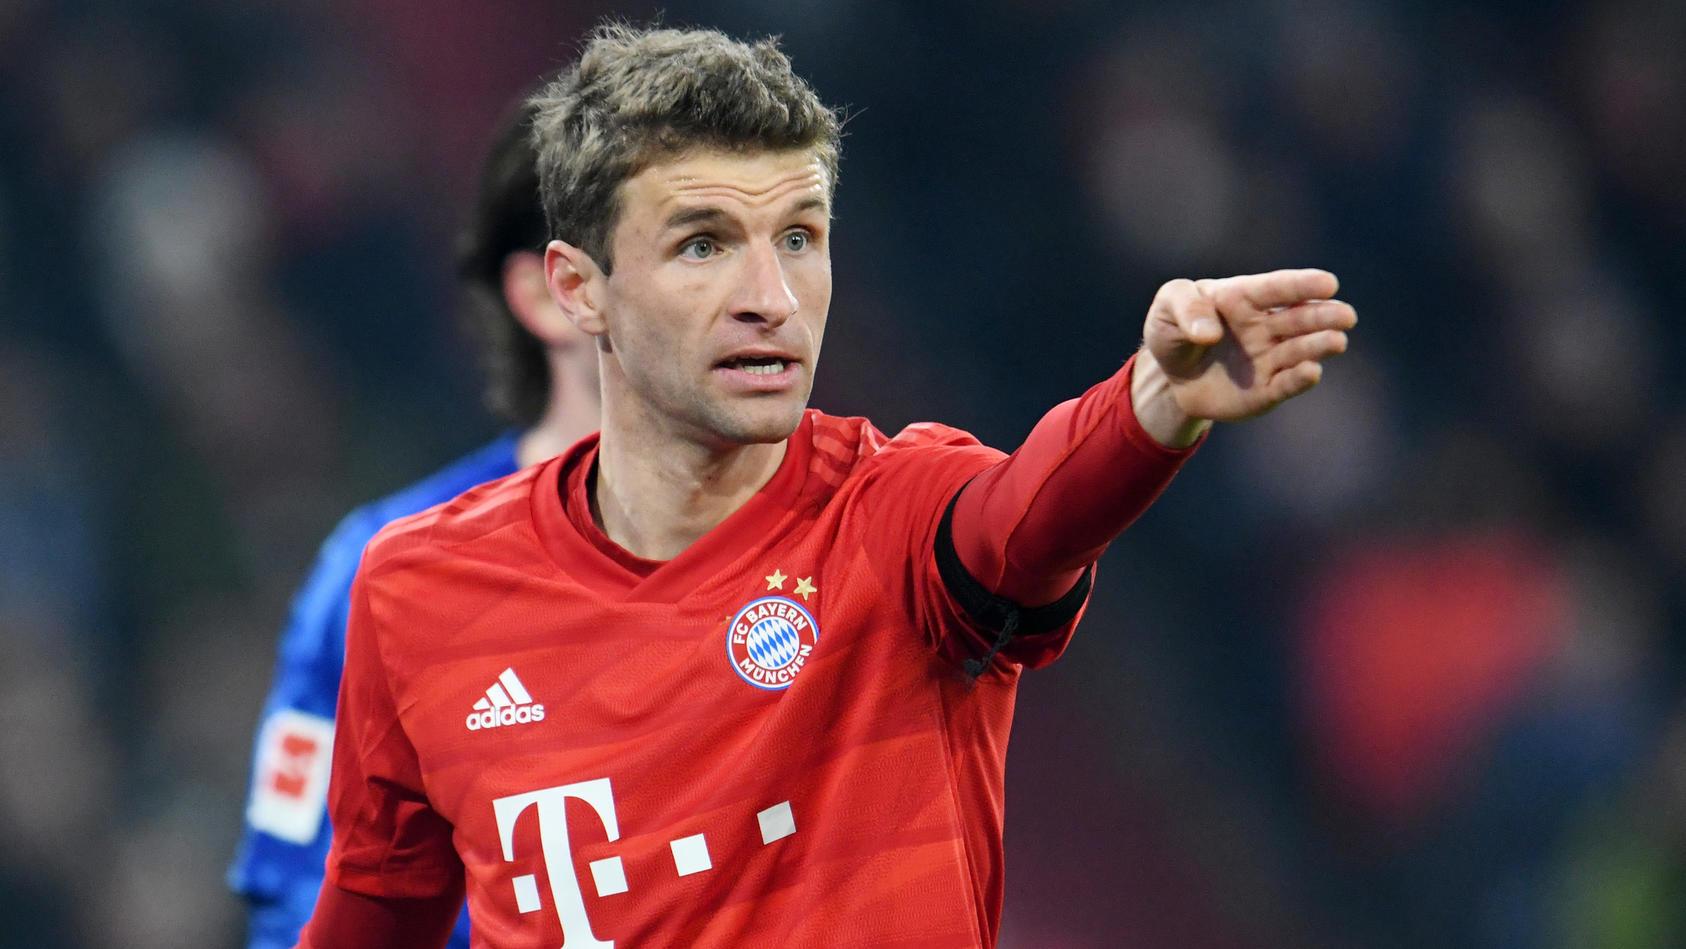 Thomas Müller zu Transfer-Aussage